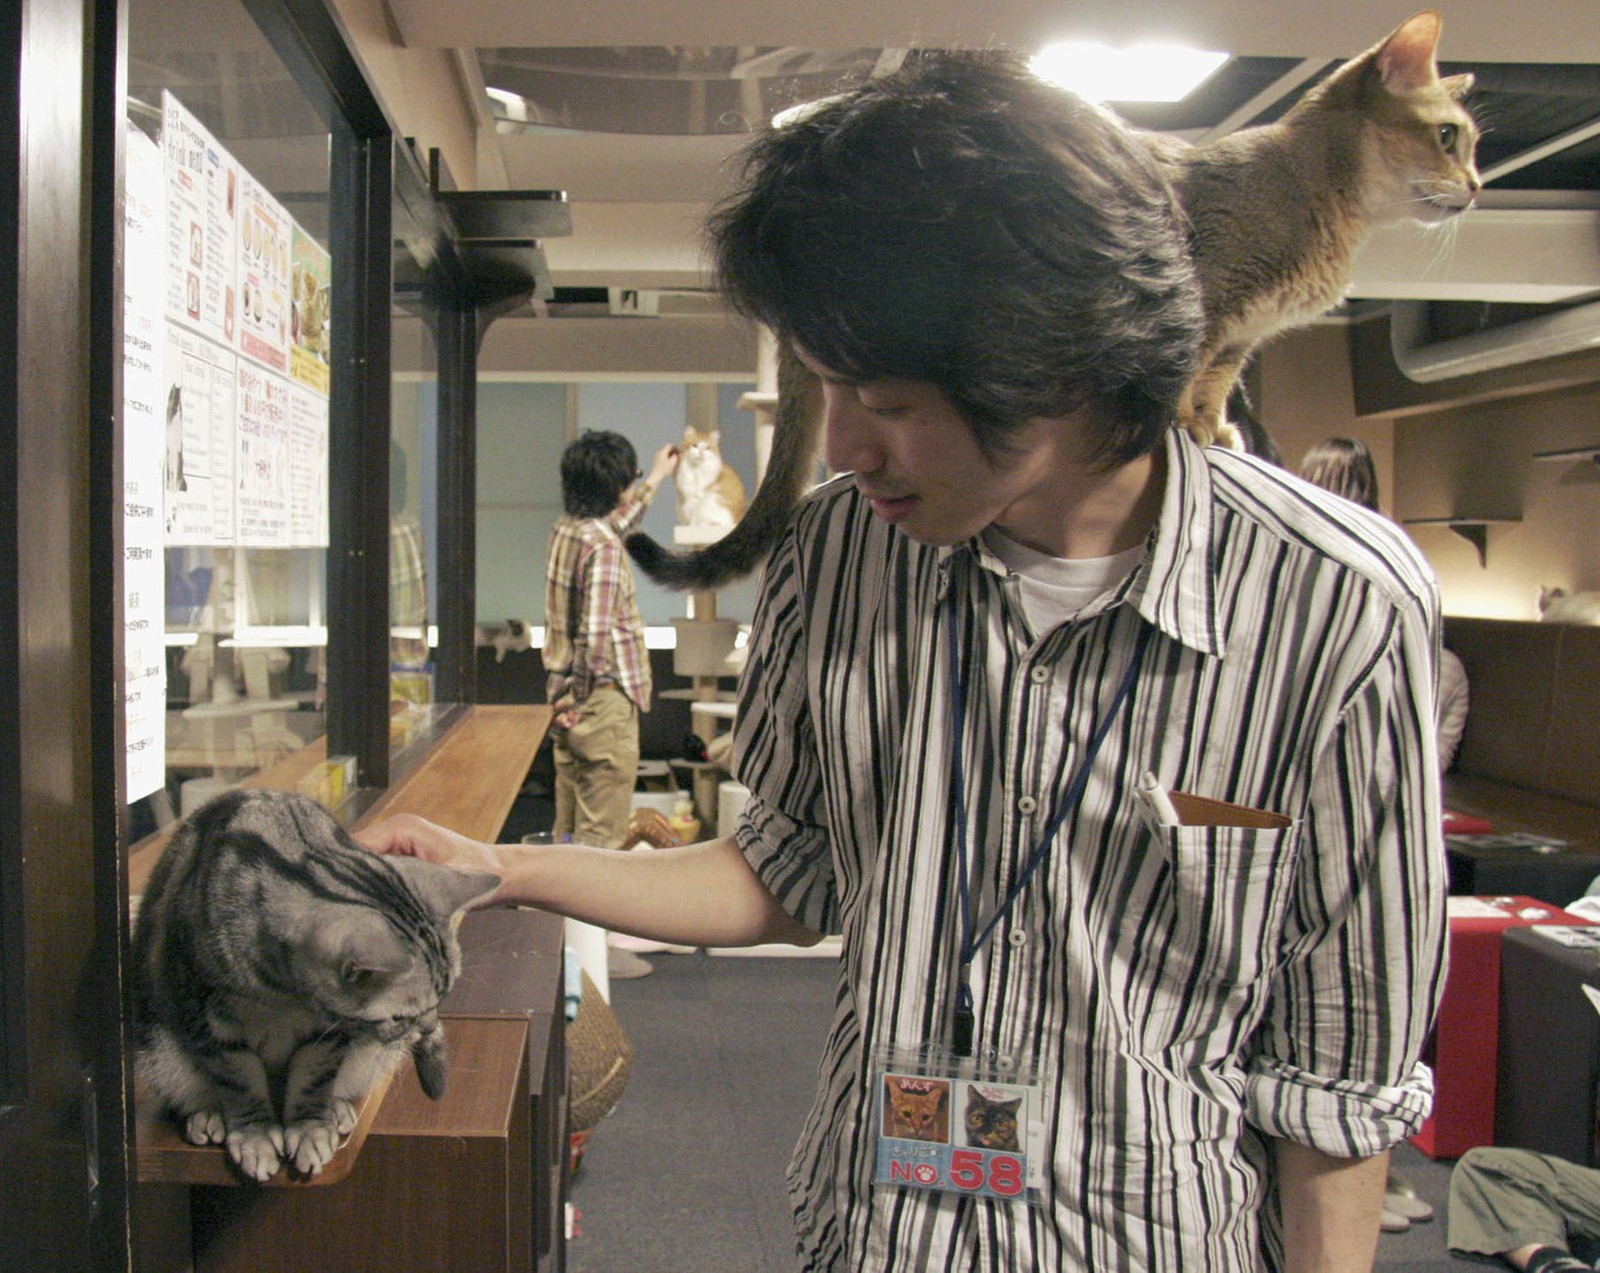 En mann klapper en katt ved kafe Calico i Tokyo. Bildet er fra 2012.